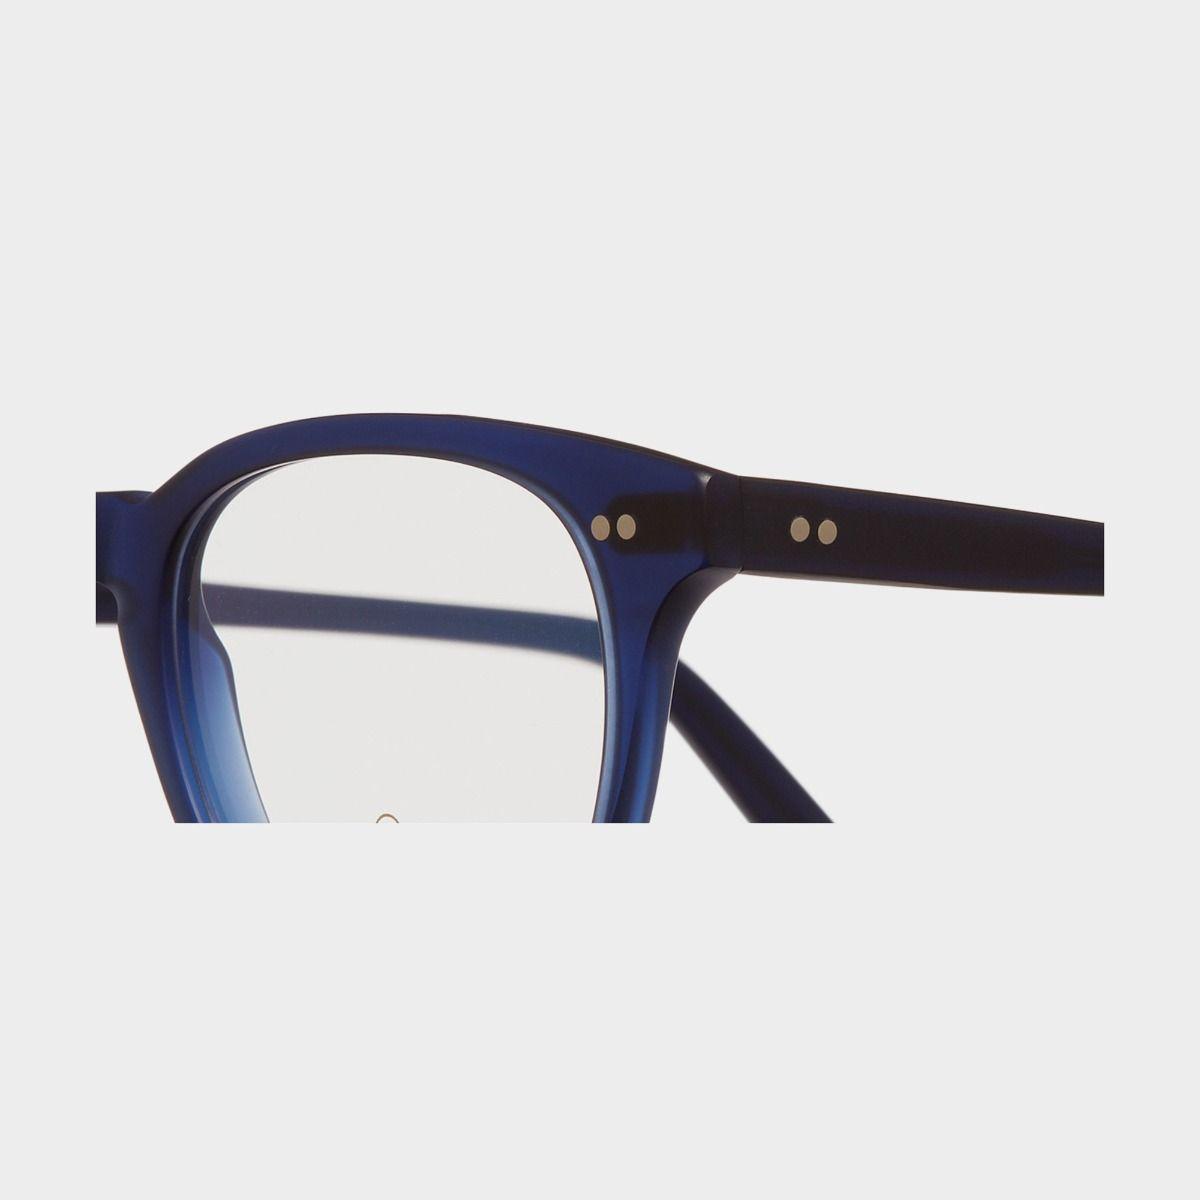 0932 Kingsman Optical Round Glasses